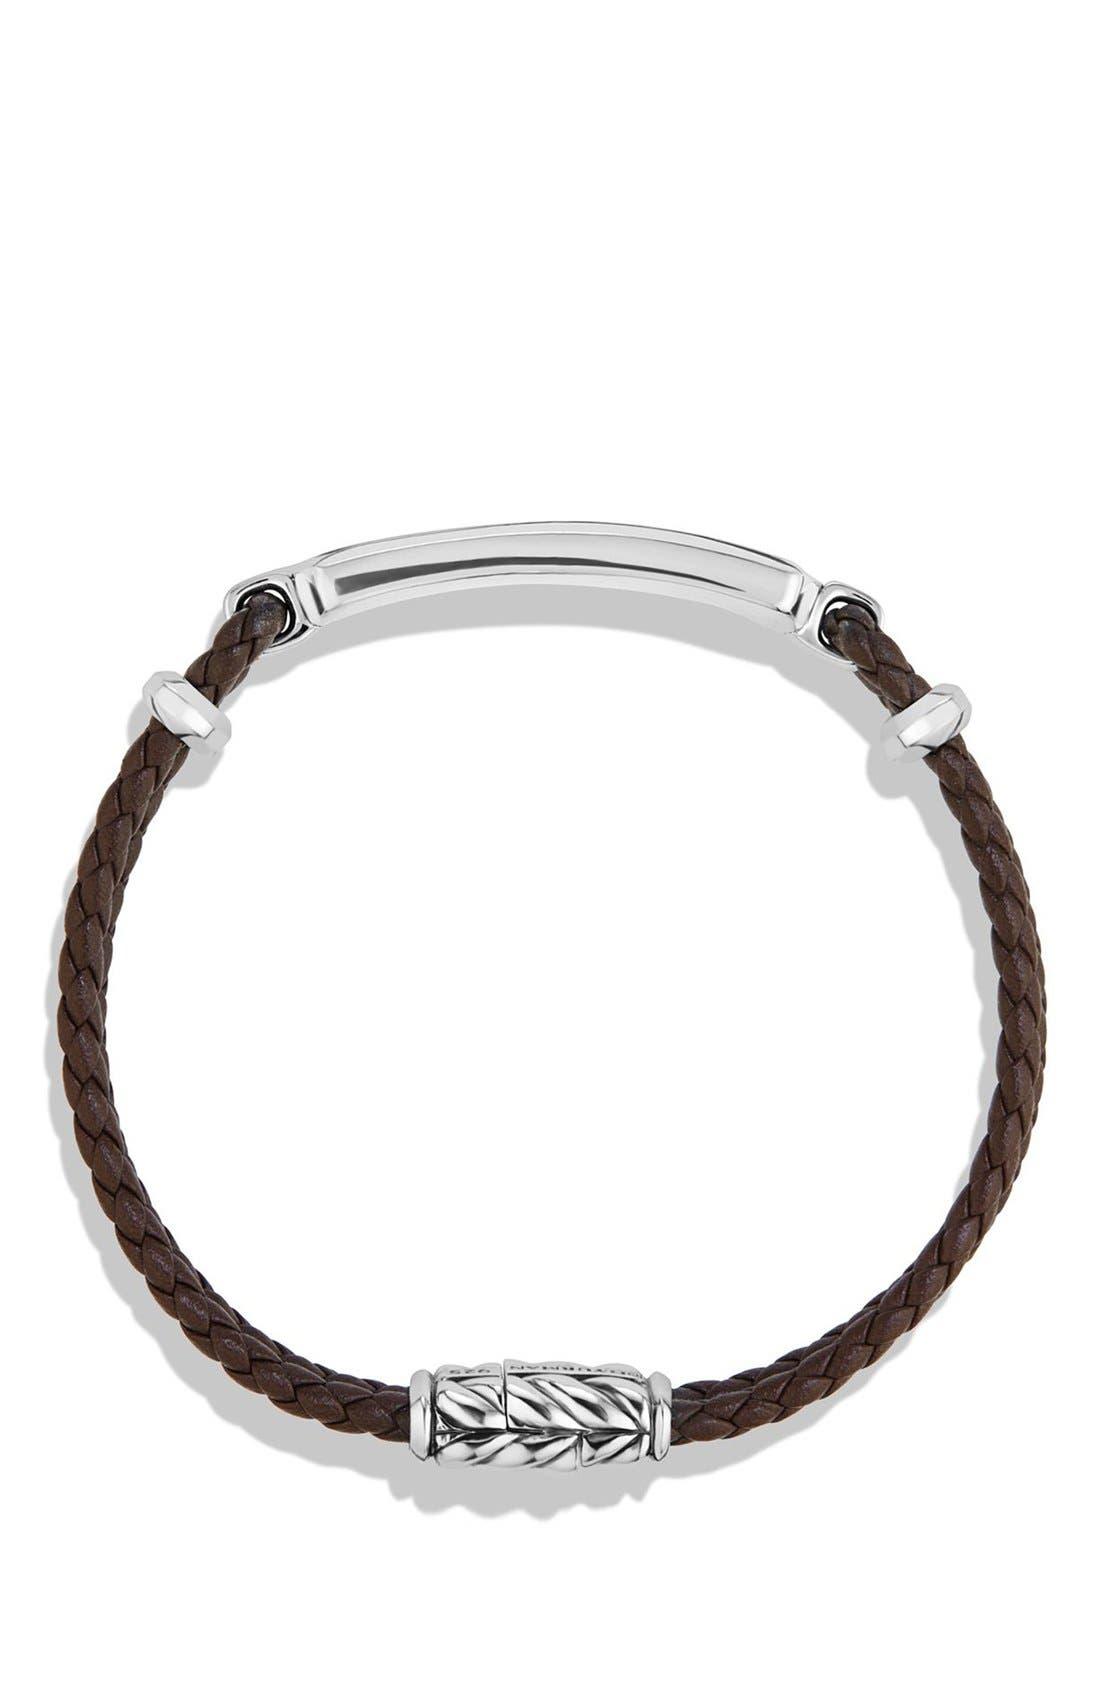 DAVID YURMAN, Bar Station Leather Bracelet, Alternate thumbnail 2, color, SILVER/ TIGERS EYE